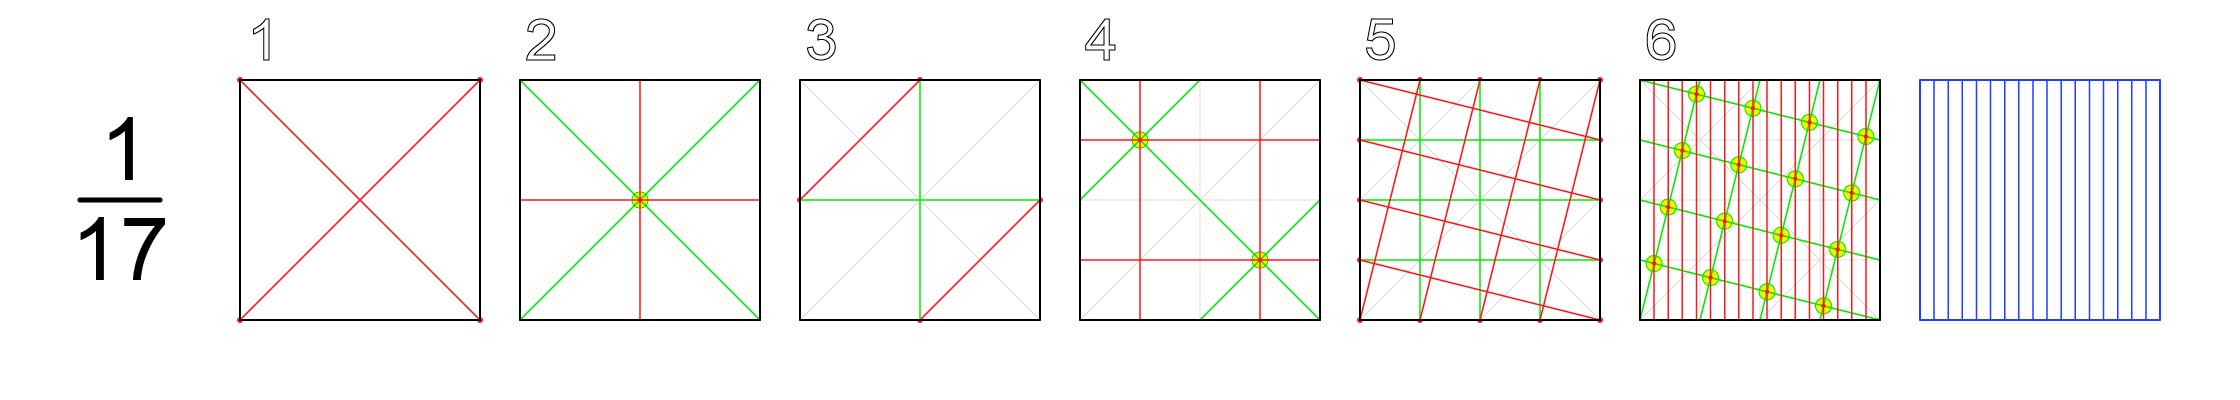 split a pdf into two parts